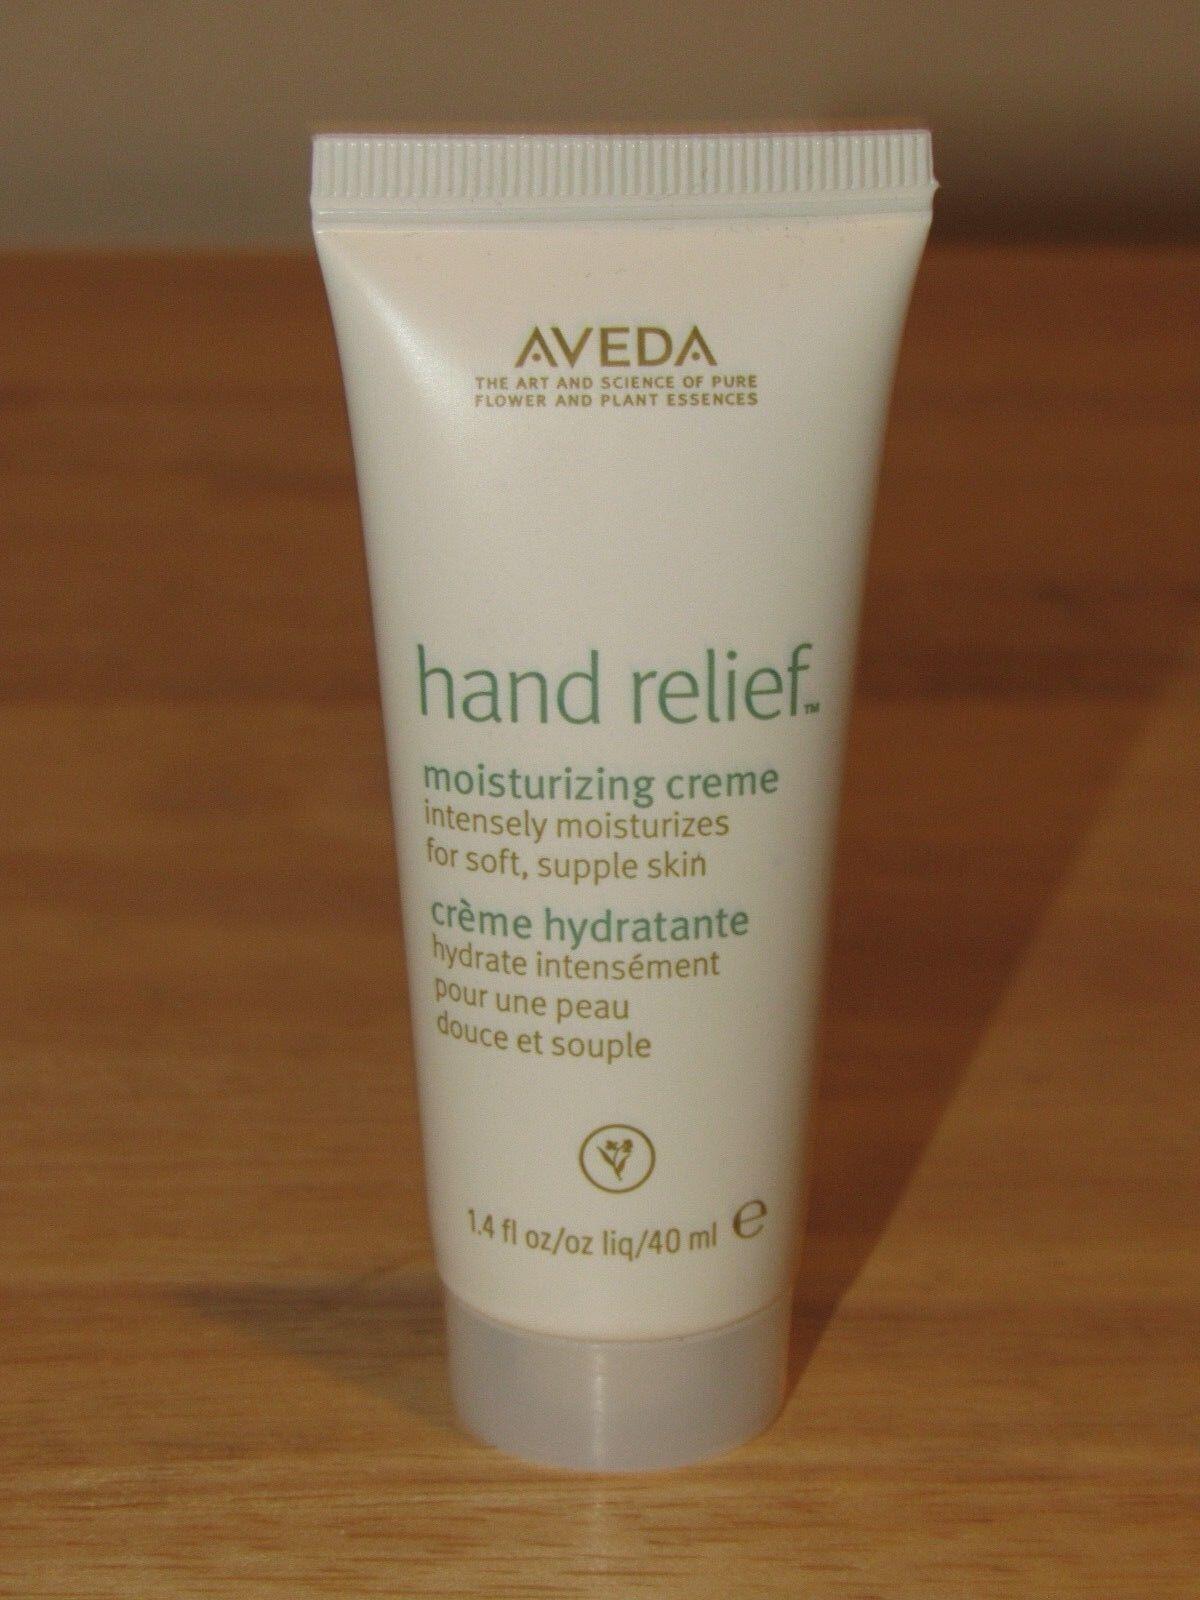 Aveda Hand Relief 1.4 oz